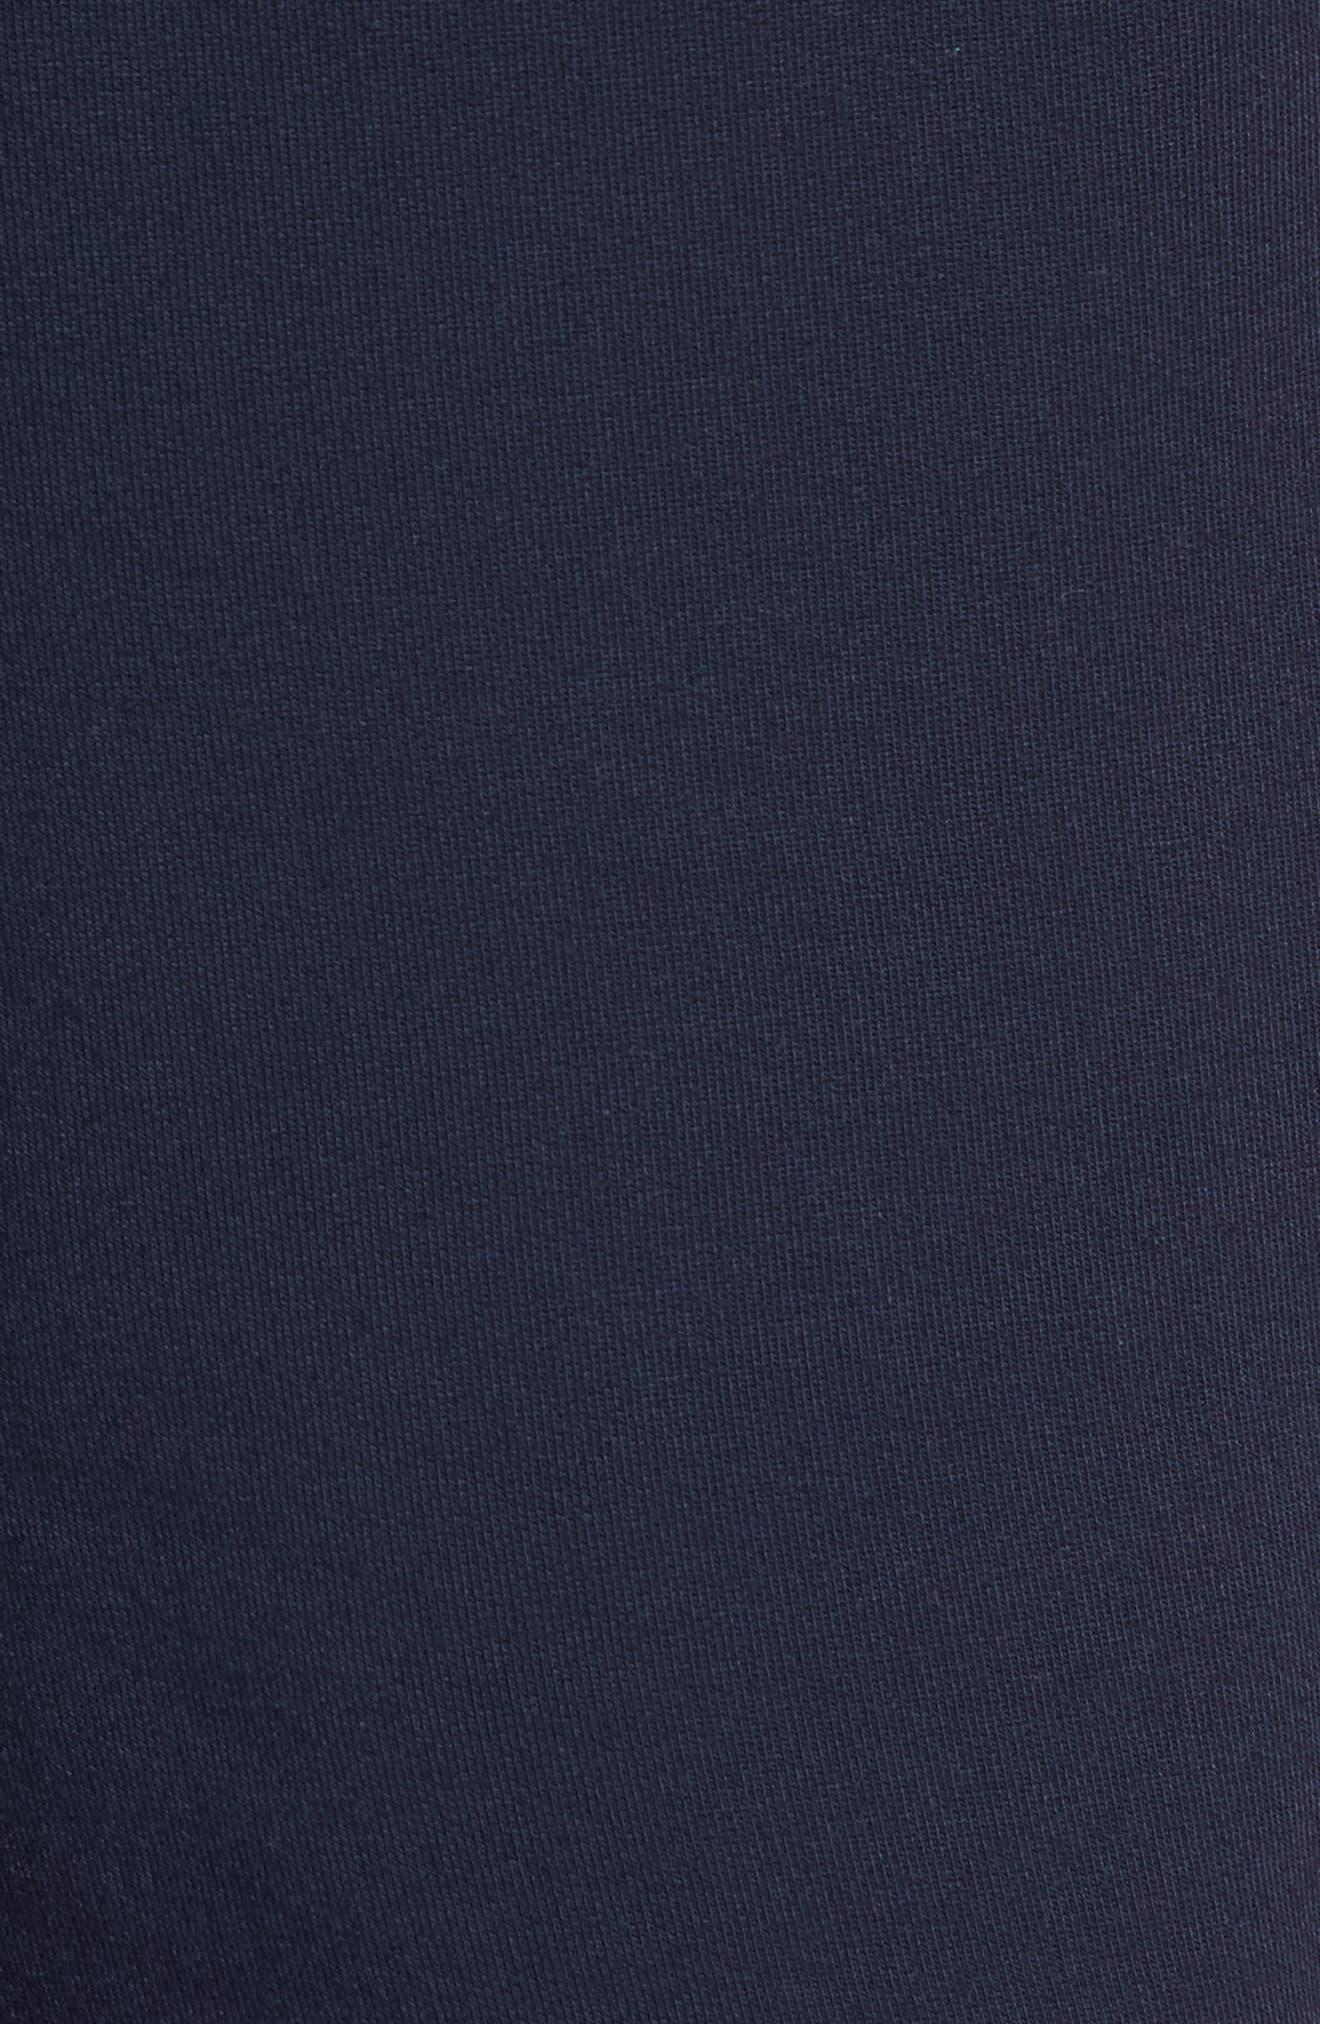 Modal Blend Lounge Shorts,                             Alternate thumbnail 5, color,                             Ink